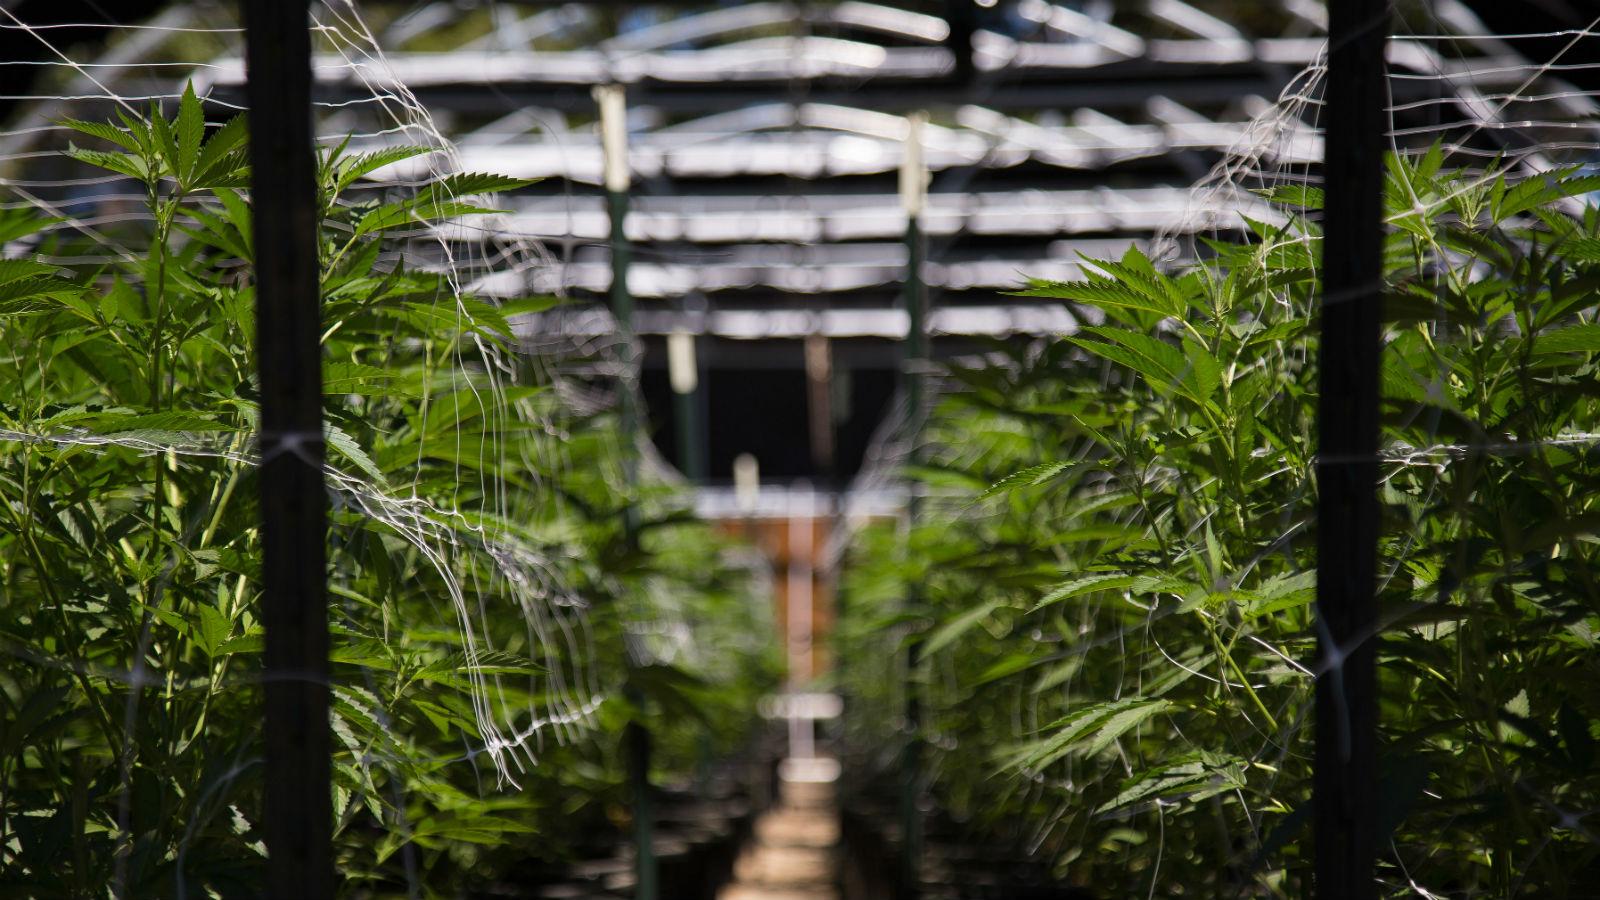 CannaOutsider Seeks to Simplify Marijuana Initiatives for the Missouri Voter